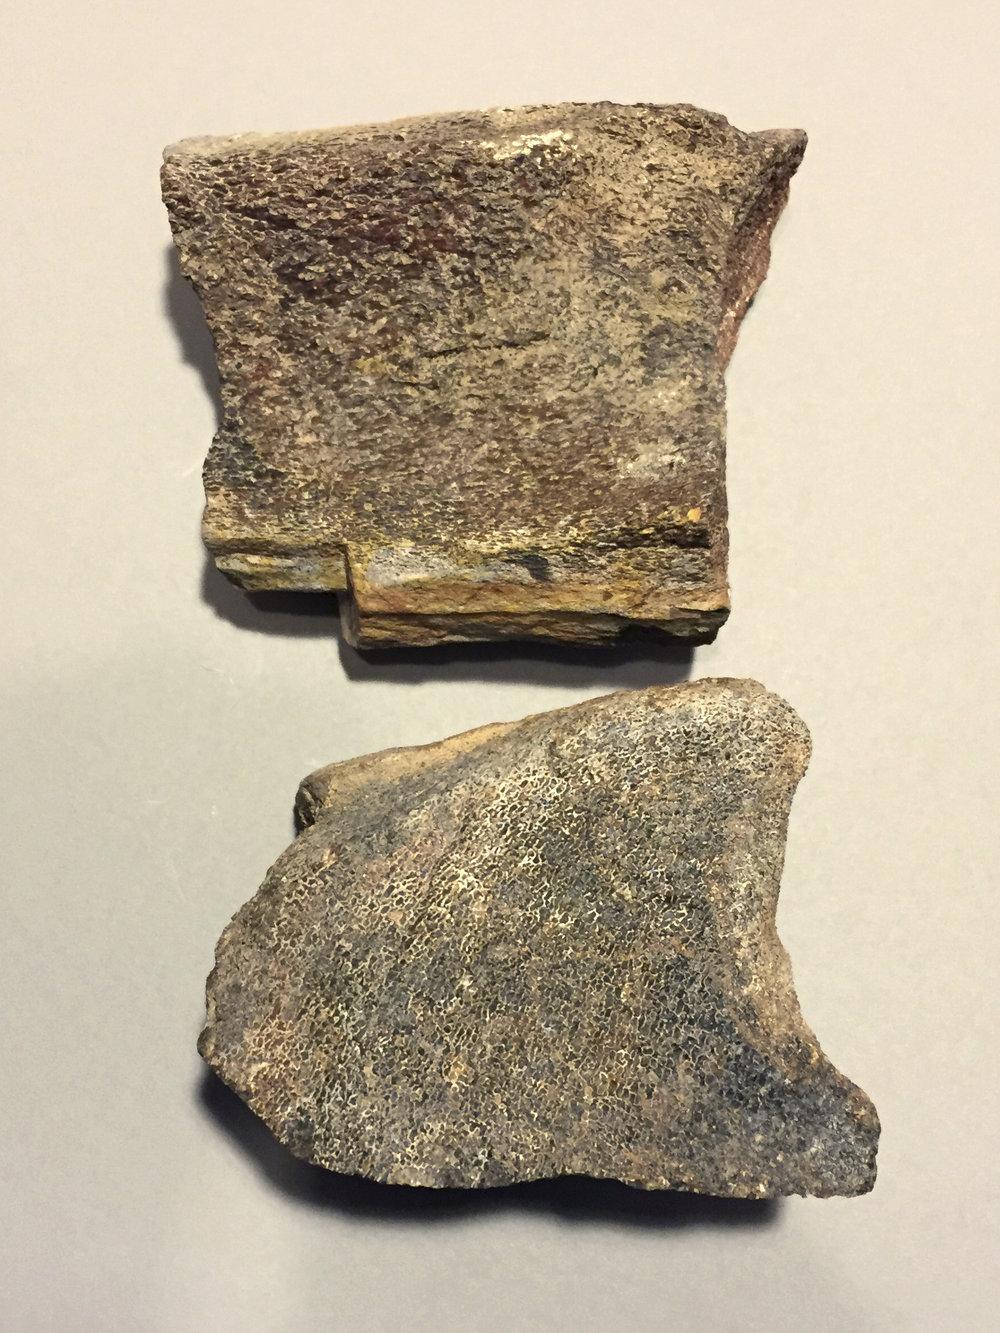 Vertebrata (Reptilia)  Dinosaur bone fragment from a Brontosaurus, from the upper Jurassic period (150 million years)